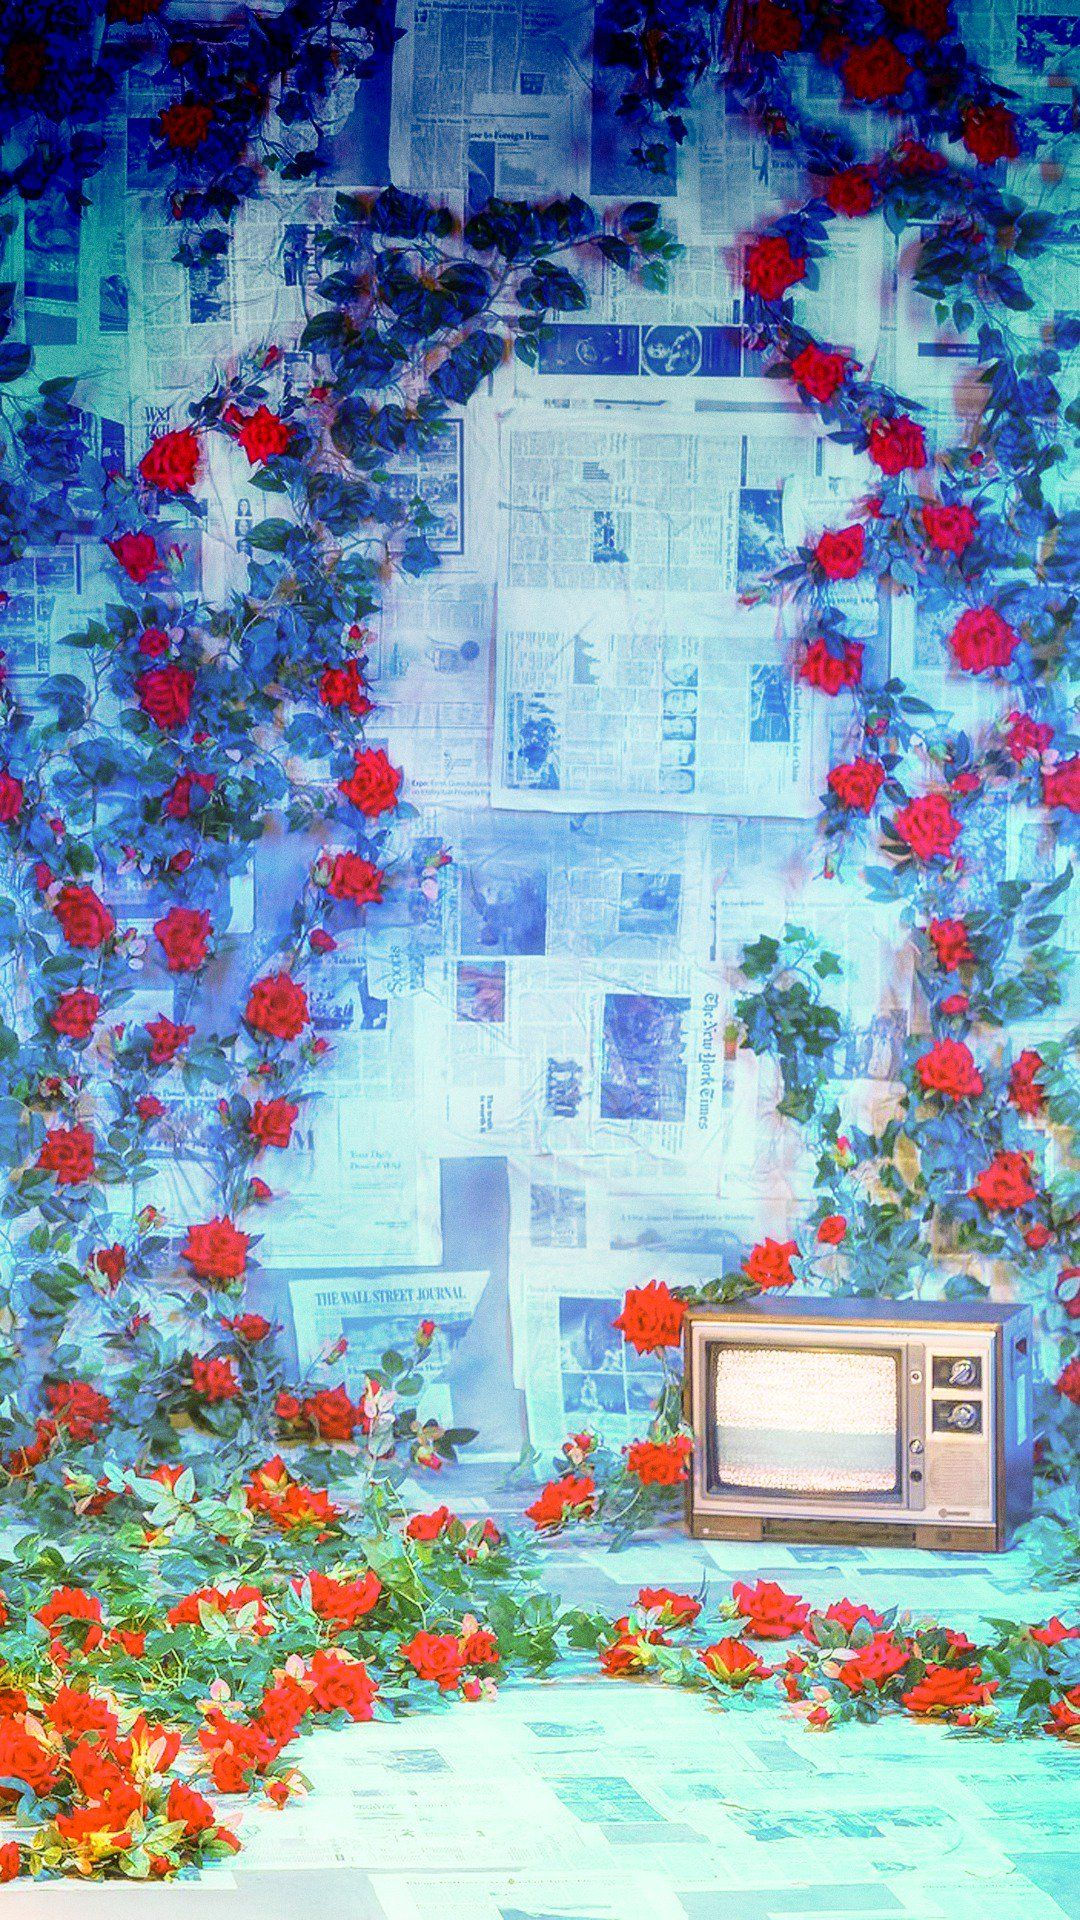 Aesthetic Bts Wallpaper 2020